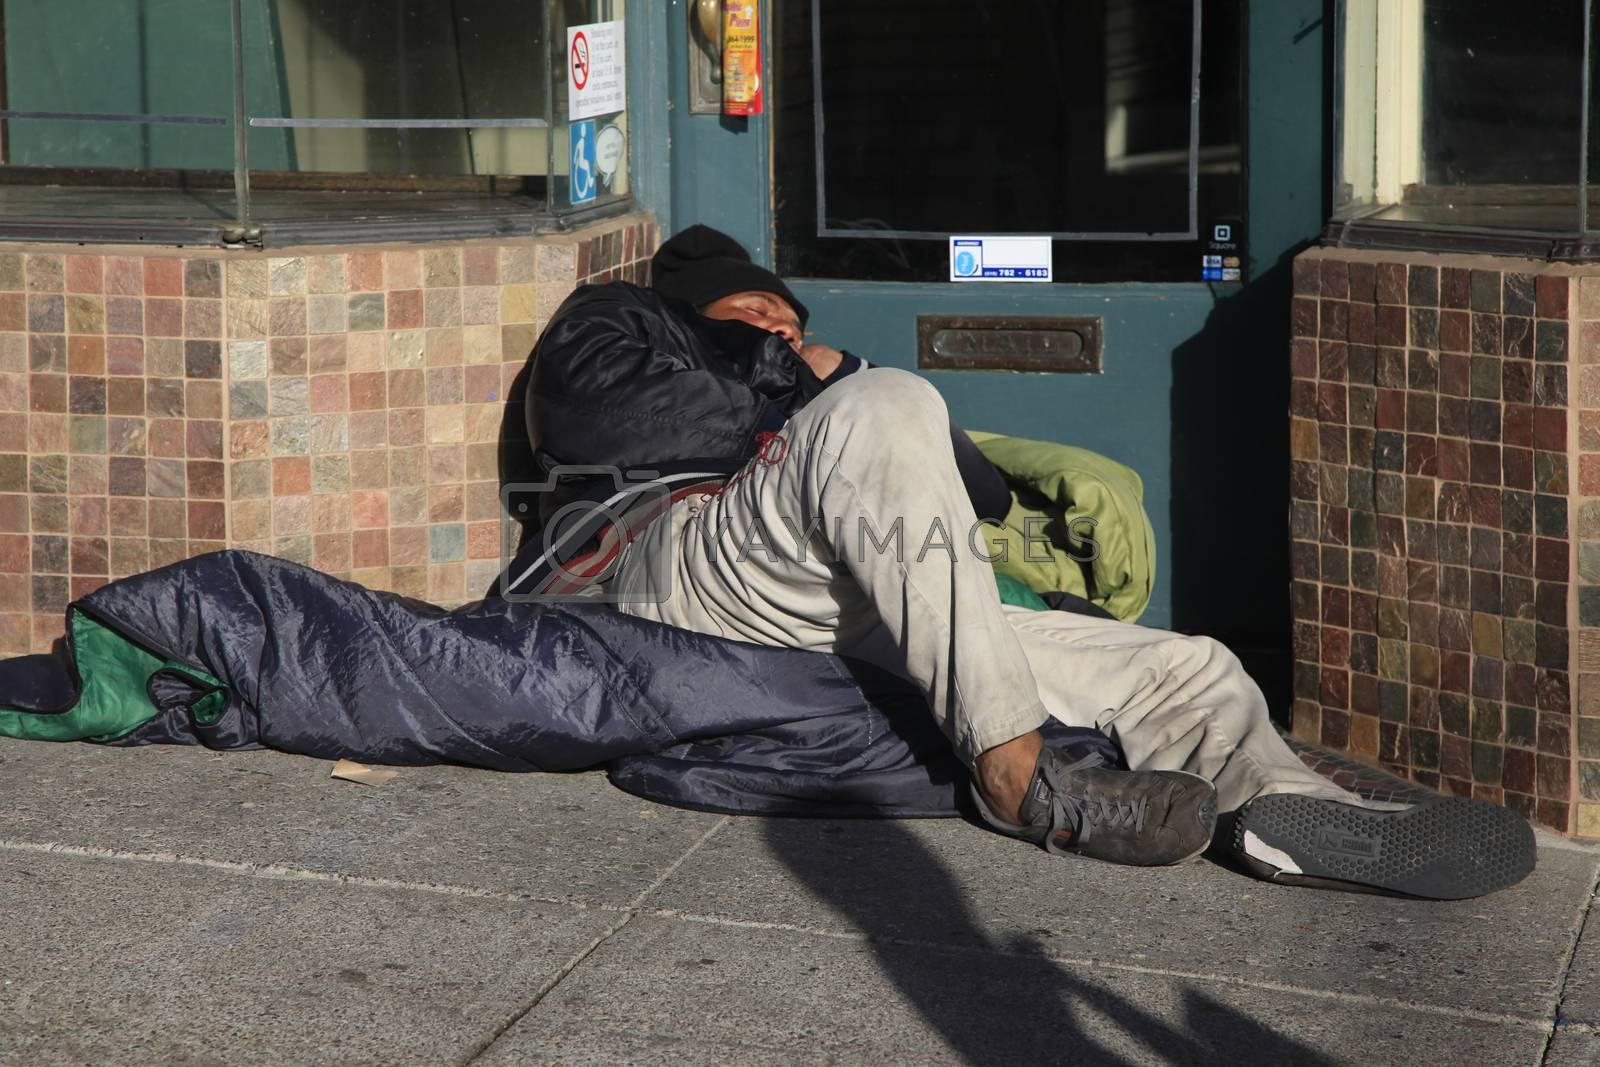 San Francisco, CA, USA - October 23, 2012: Homeless man sleeps on the street Castro in the center of San Francisco